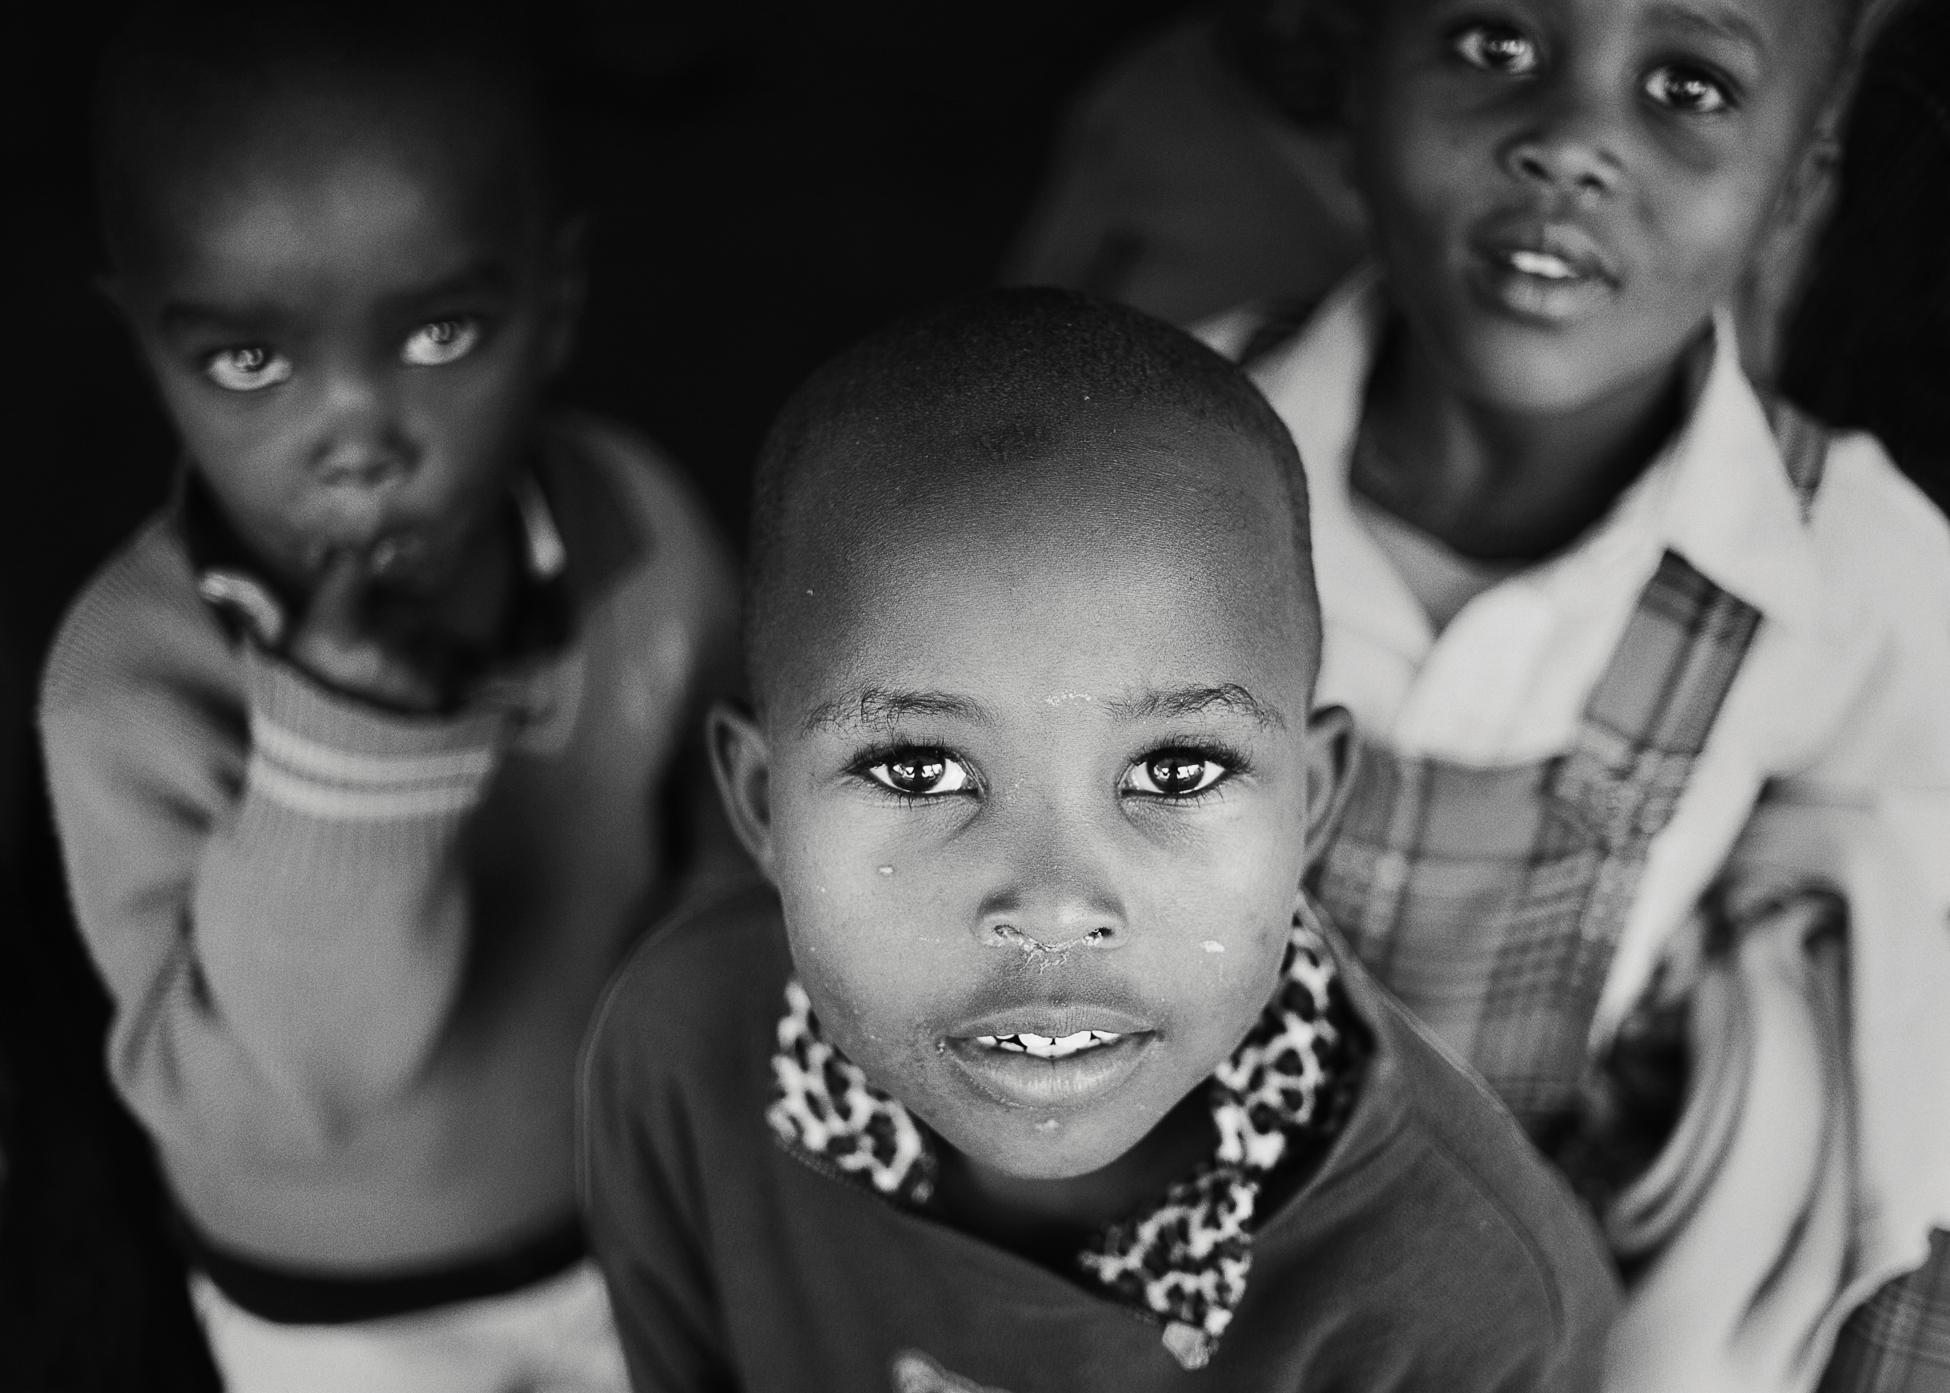 [TANZANIA] GLIMMER OF HOPE